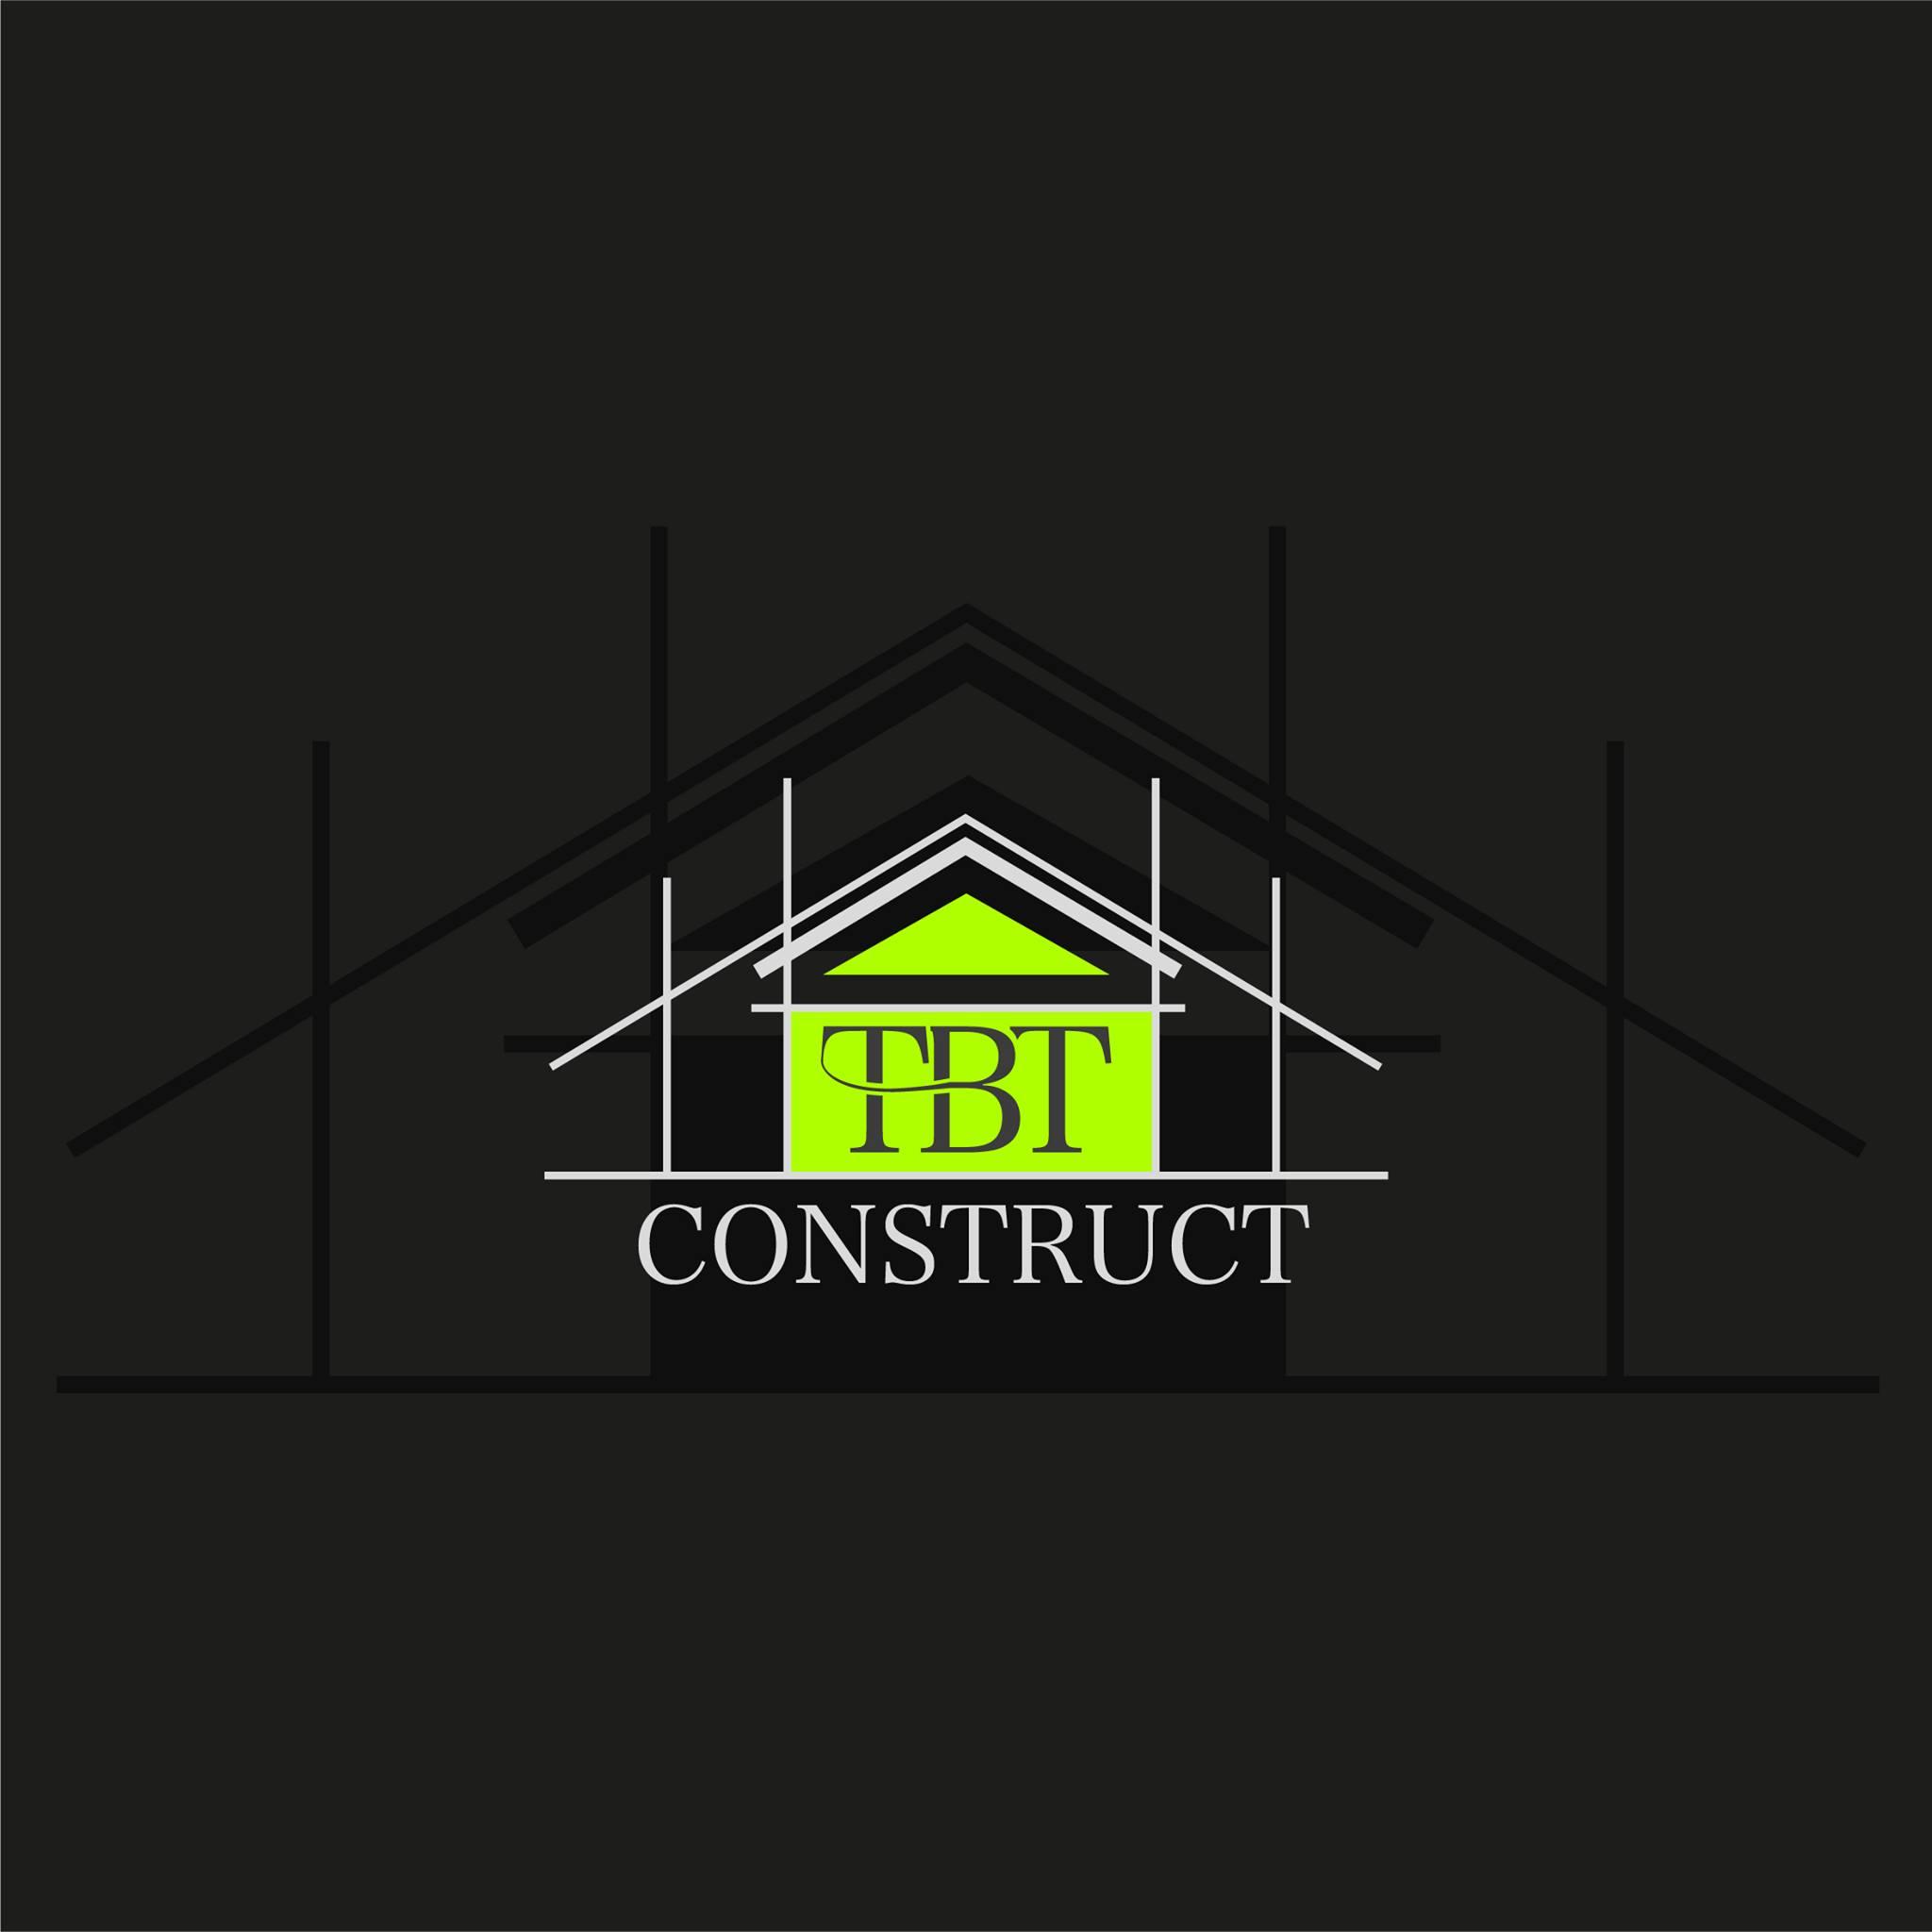 TBT Construct